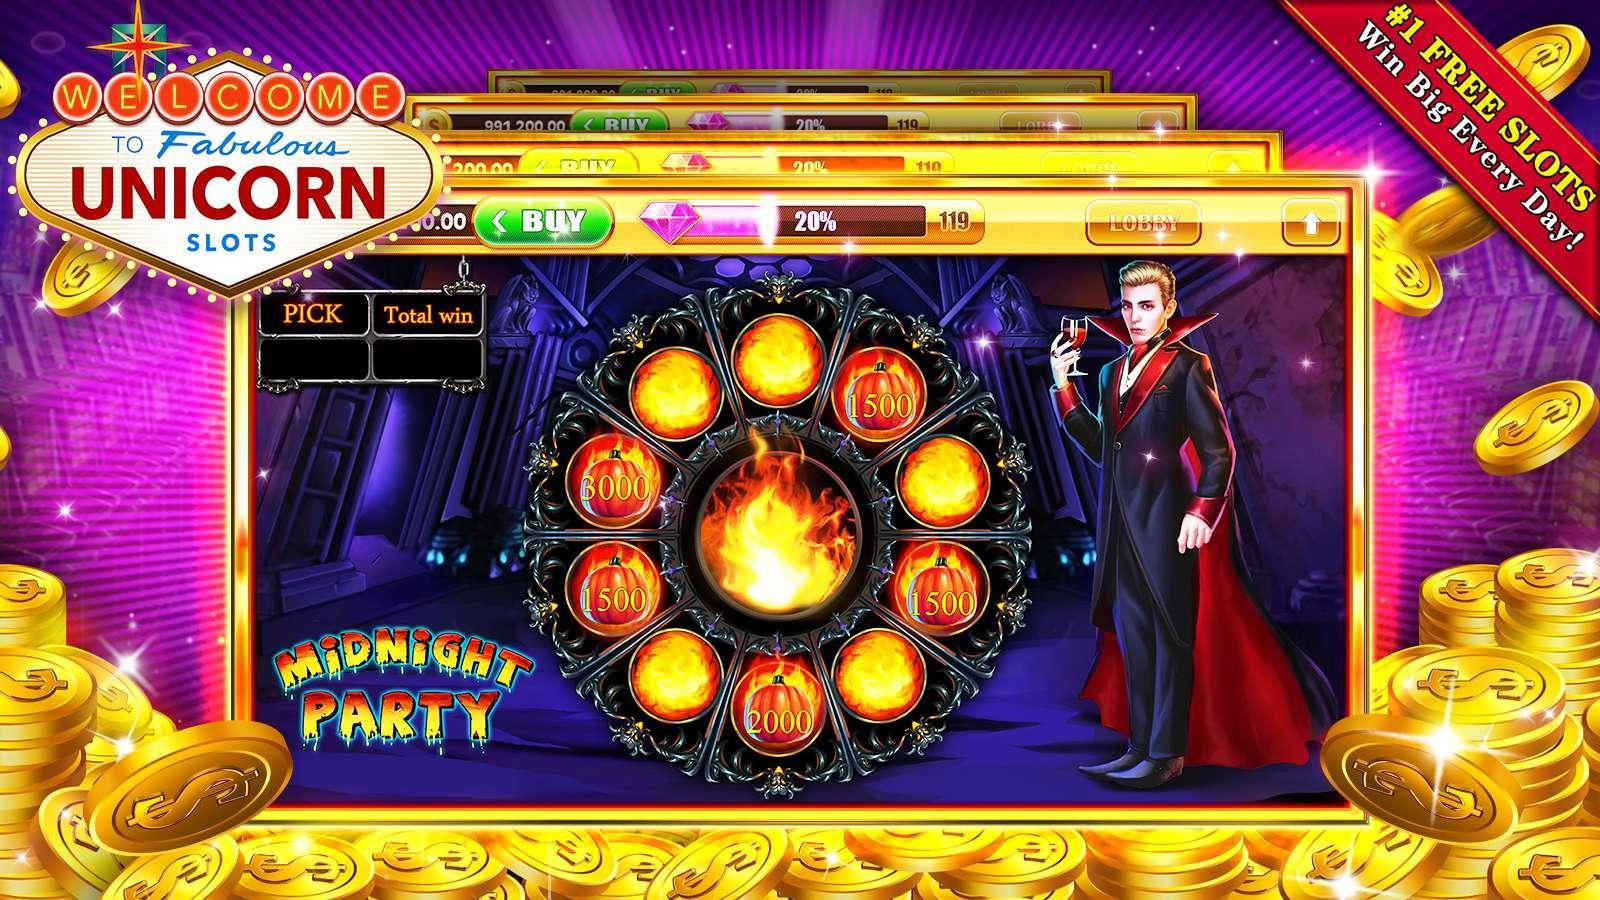 Unicorns Slot Machine - Play Mobilots Casino Games Online